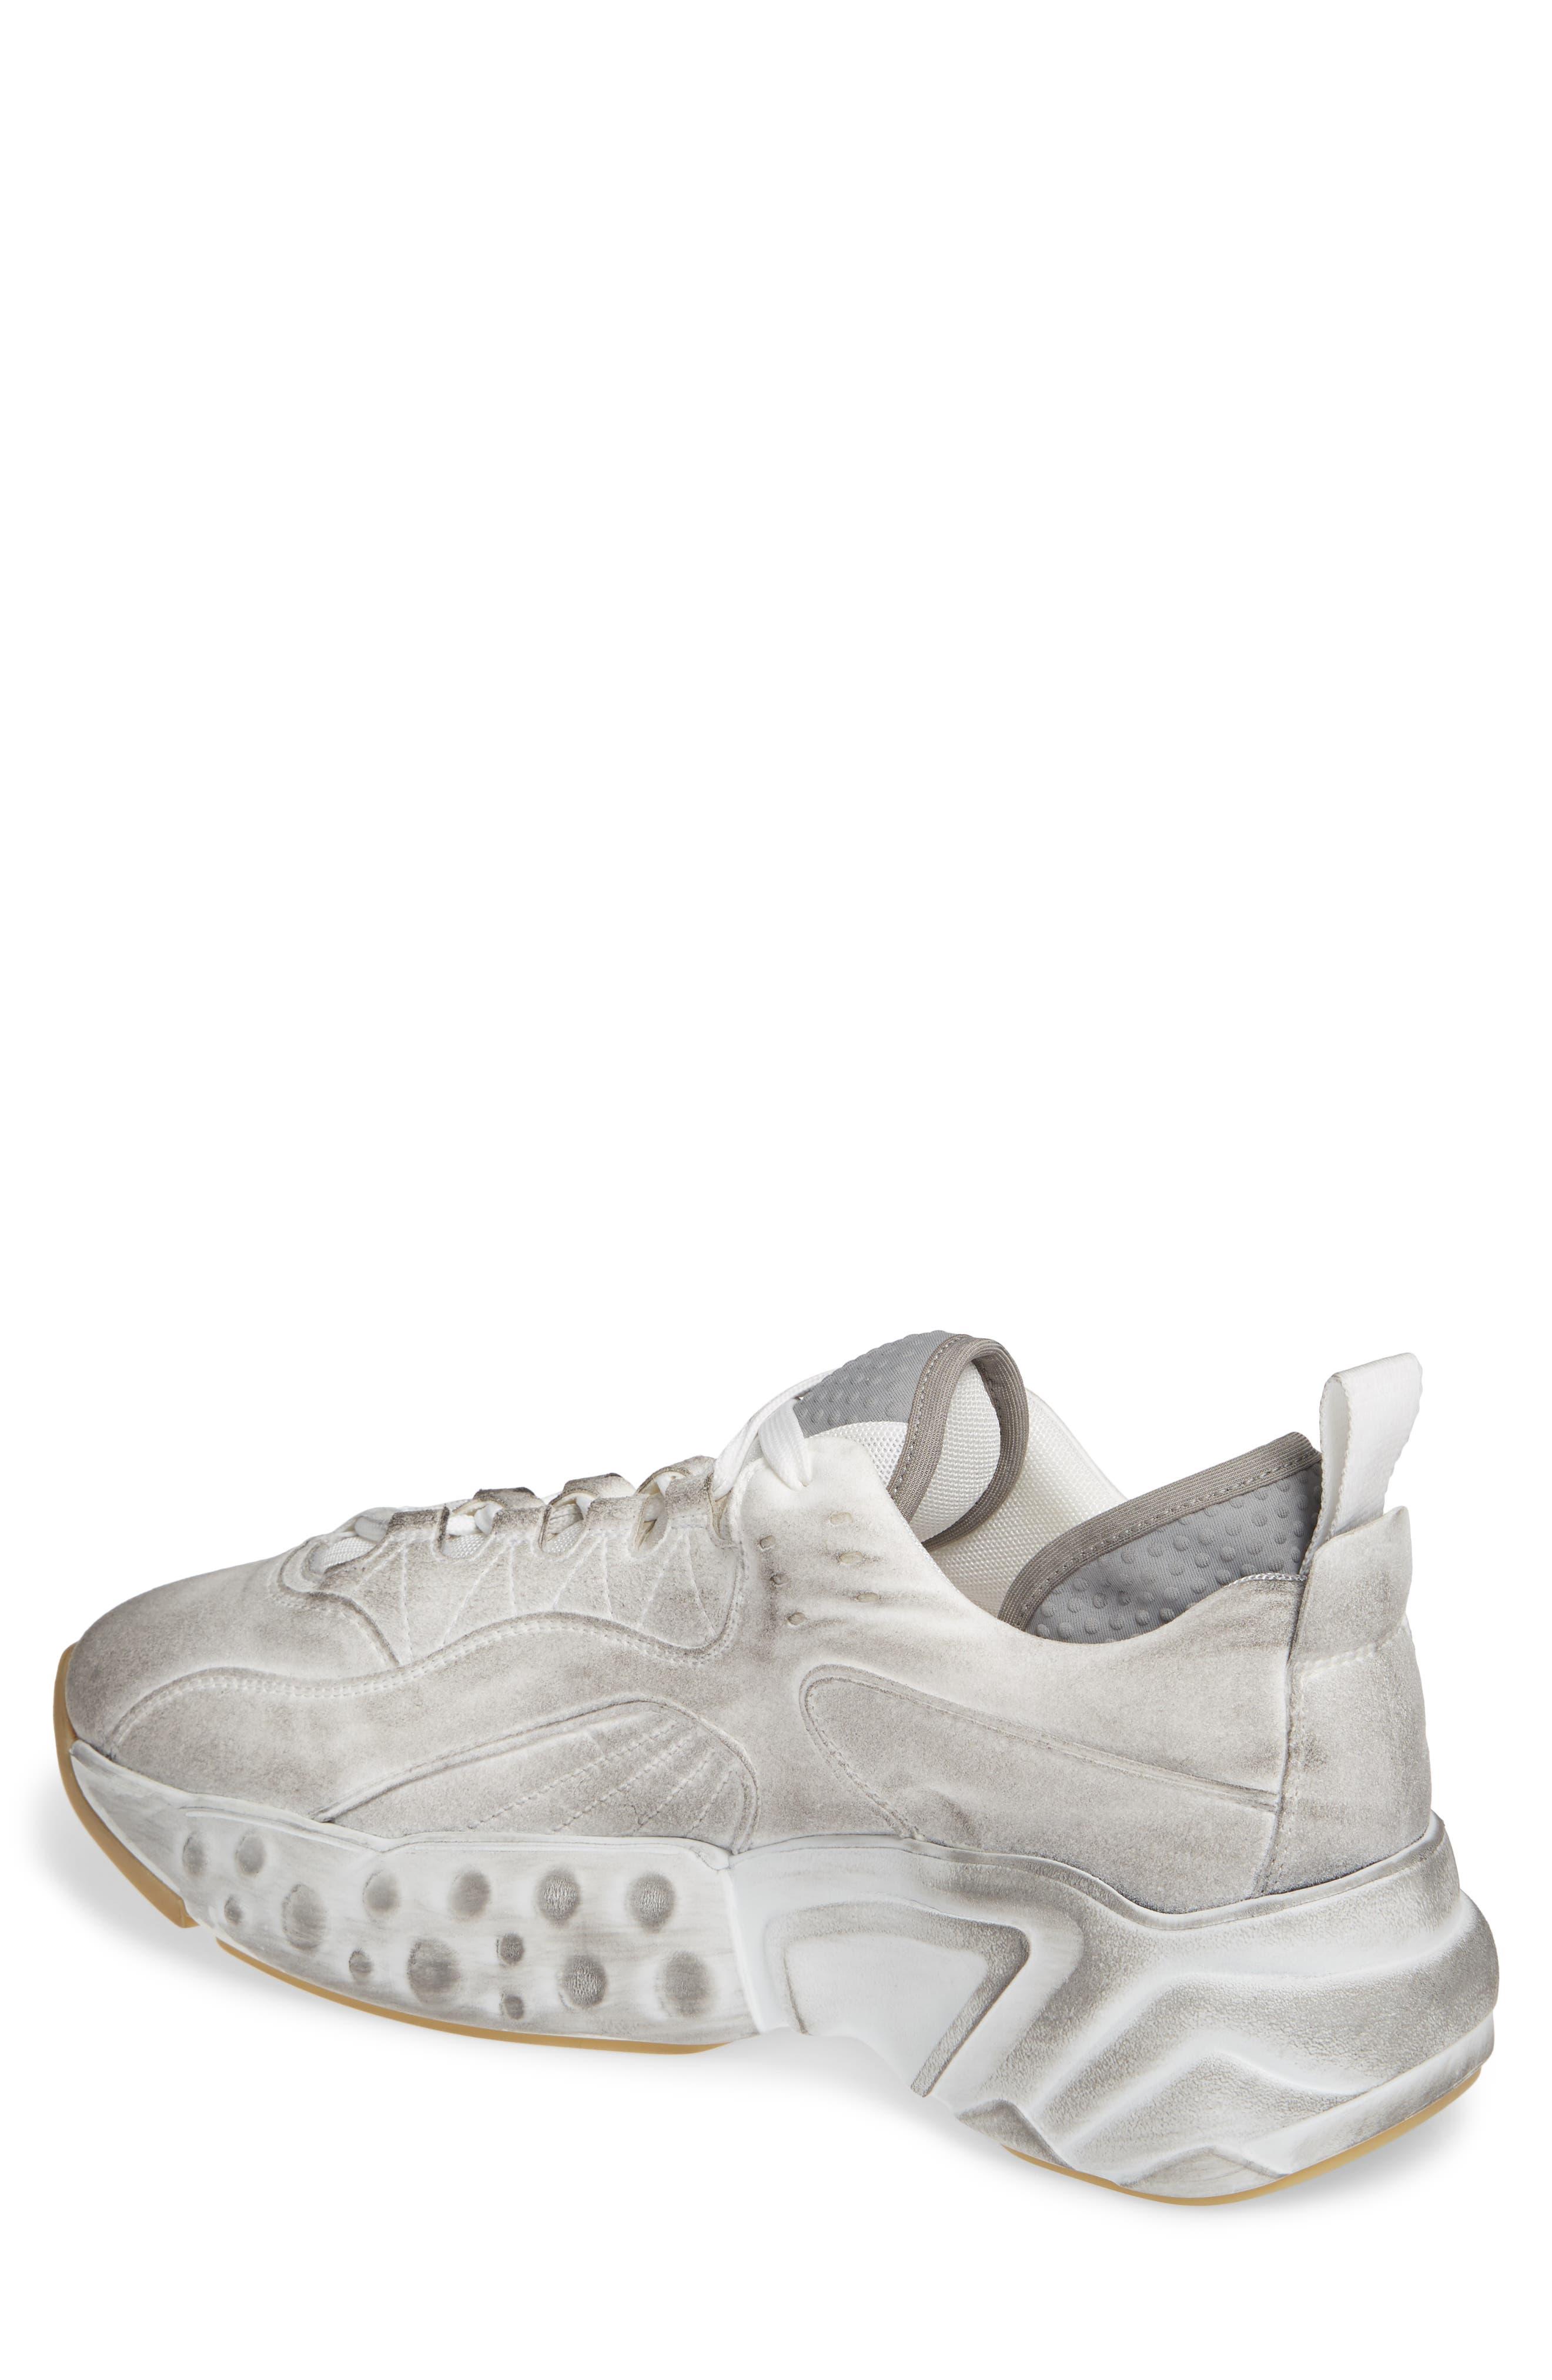 Rockaway Built-Up Sneaker,                             Alternate thumbnail 2, color,                             WHITE